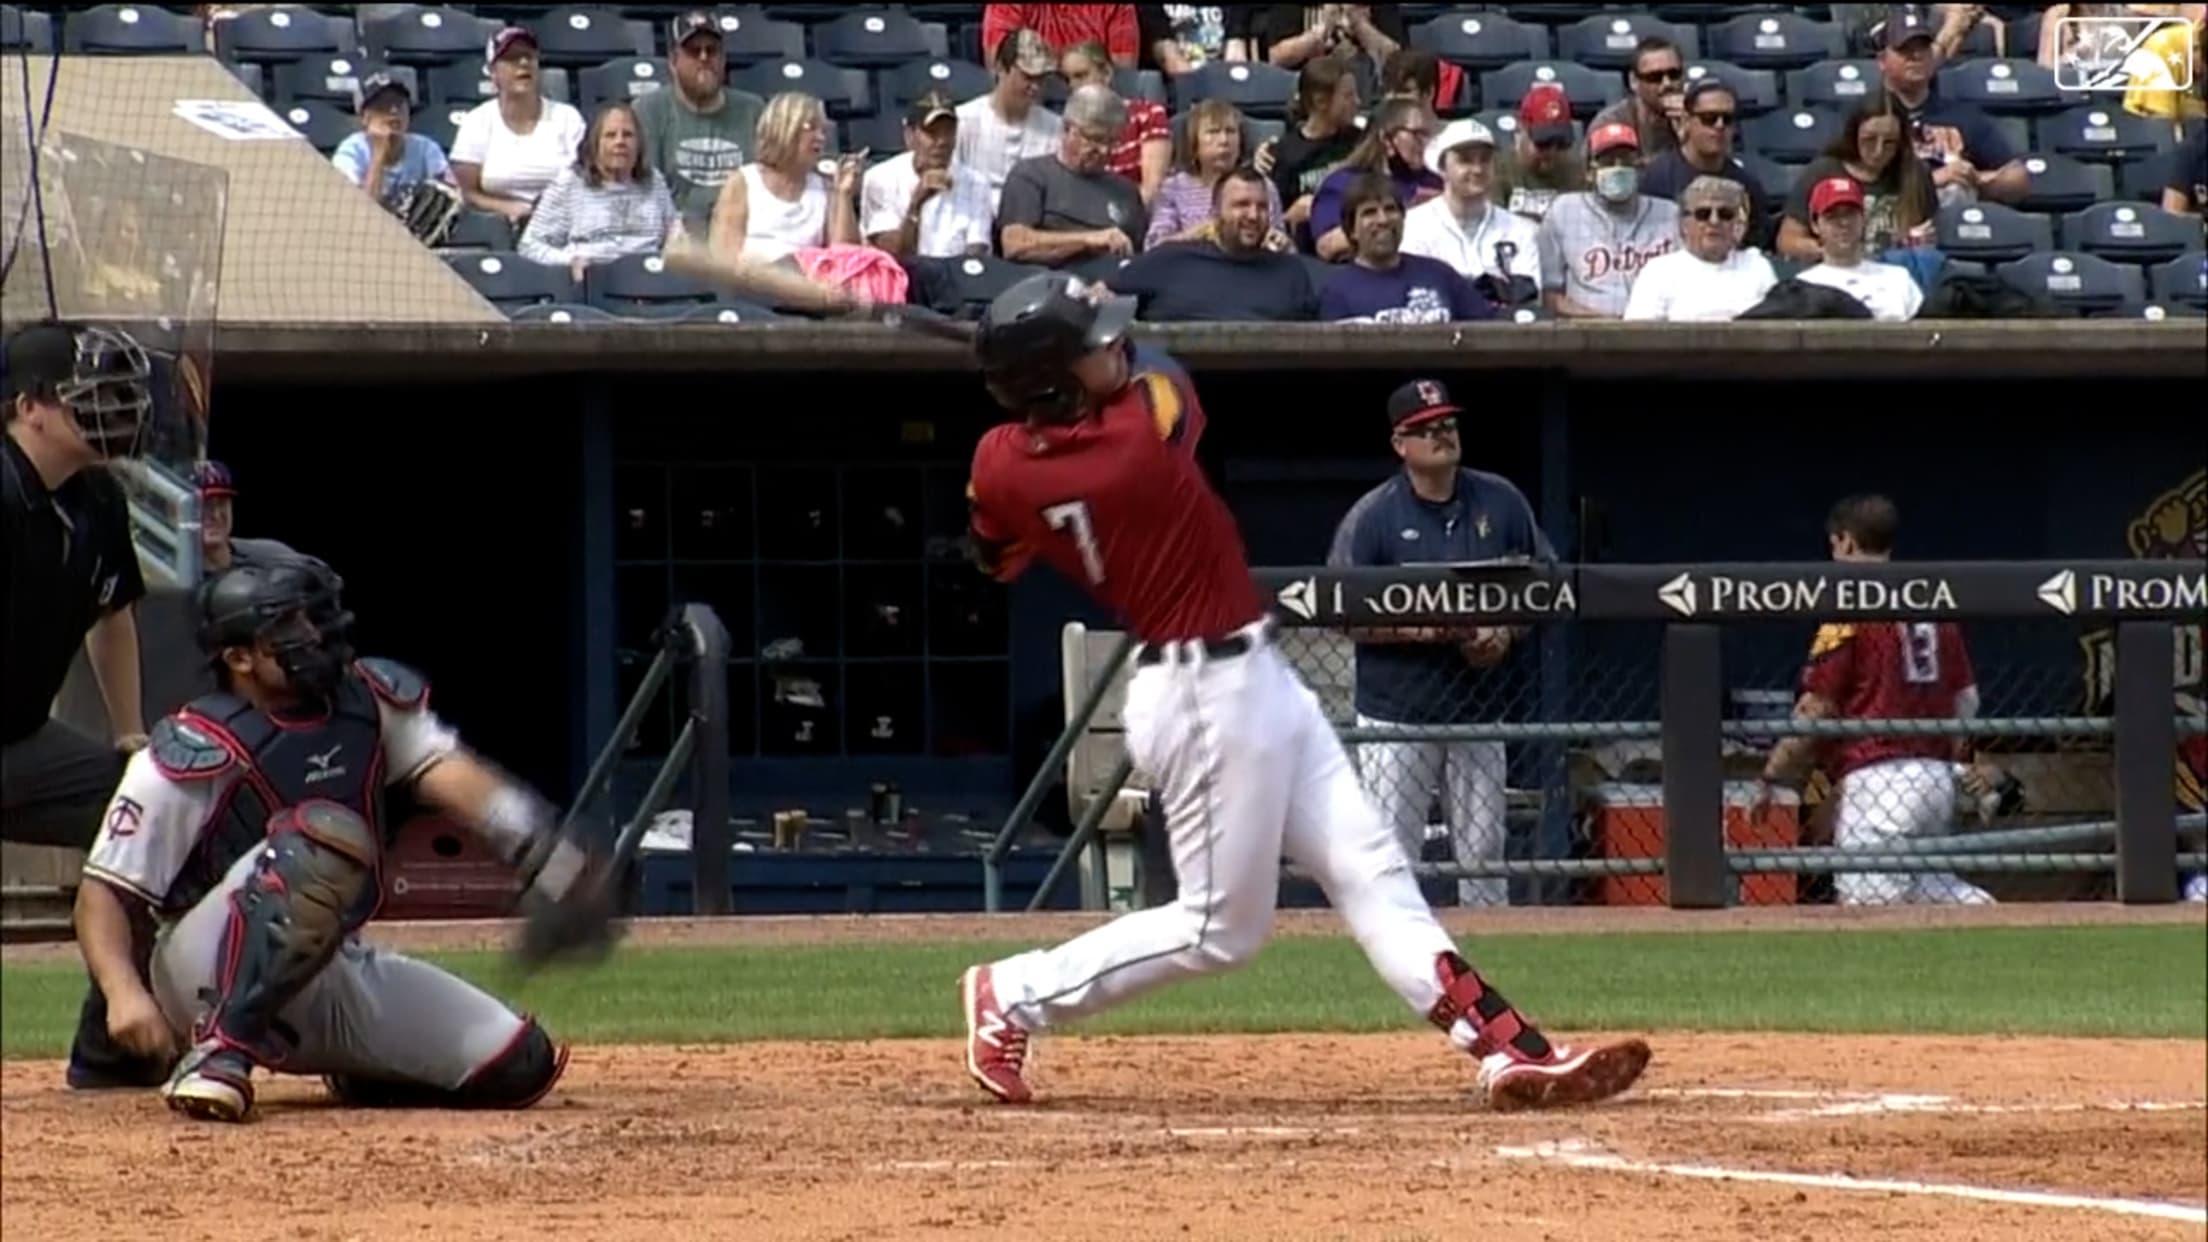 Torkelson's 30th home run